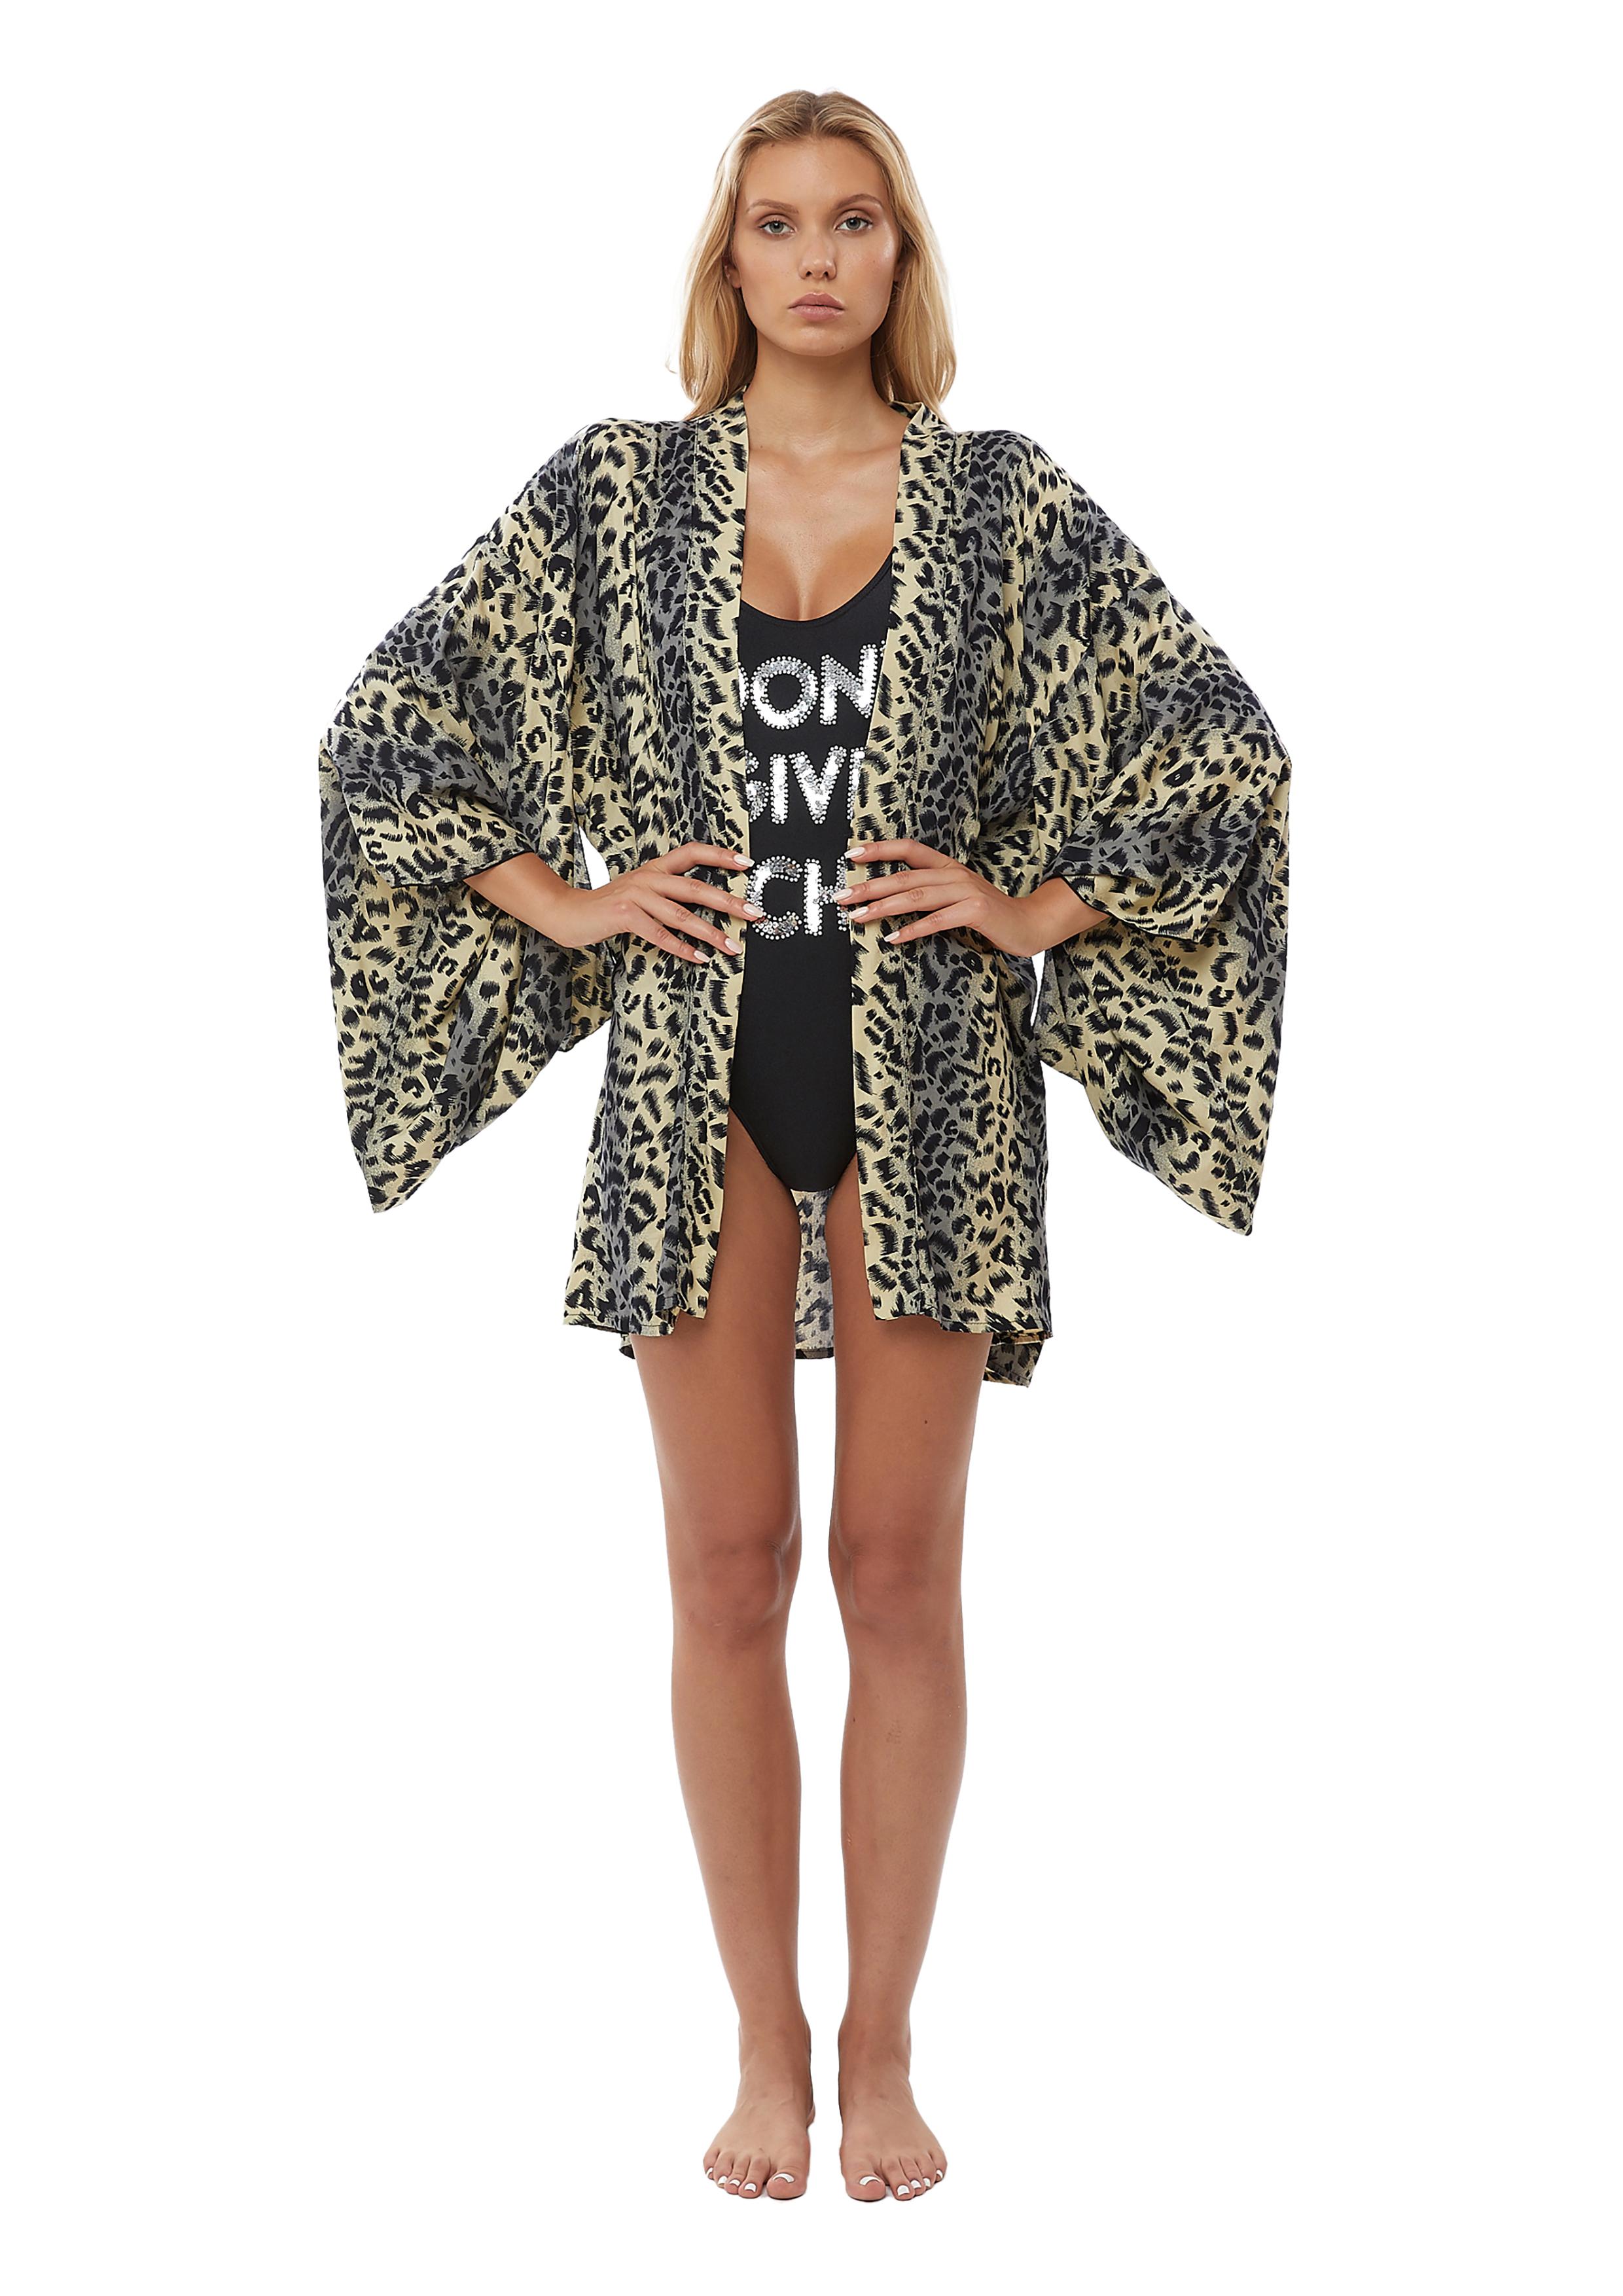 House of Muamua | Kimono | SKORT IT'S NOT YOULEOPARD